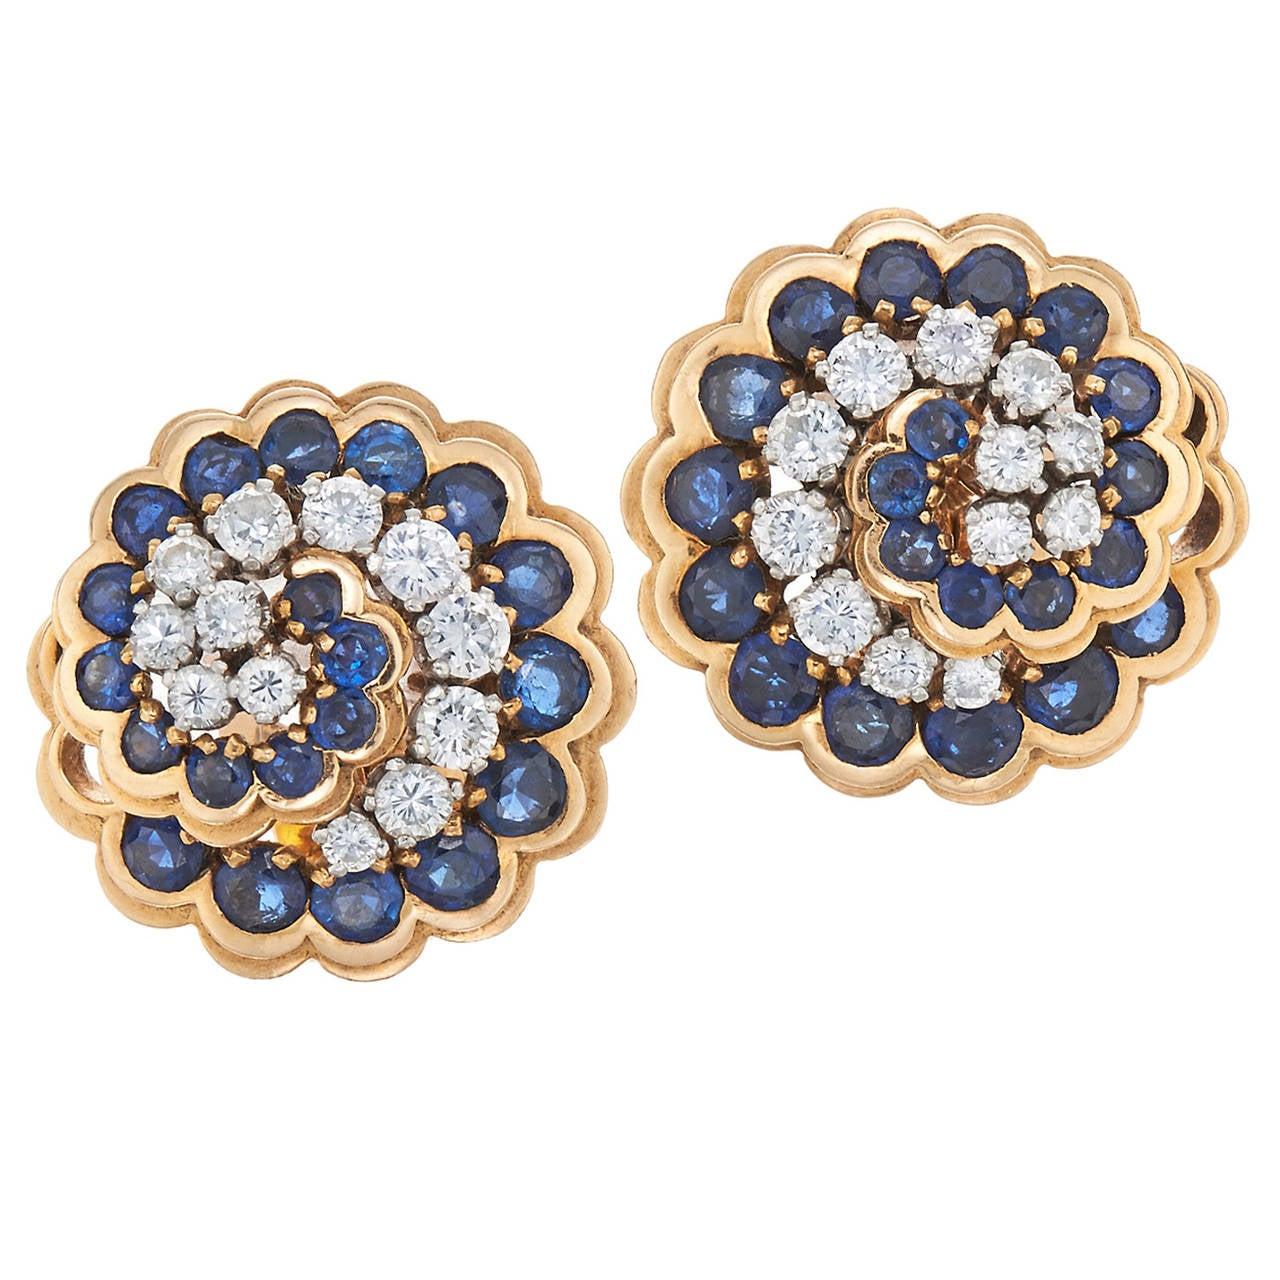 Retro Van Cleef & Arpels Paris Sapphire Diamond Gold Platinum Swirl Earrings For Sale